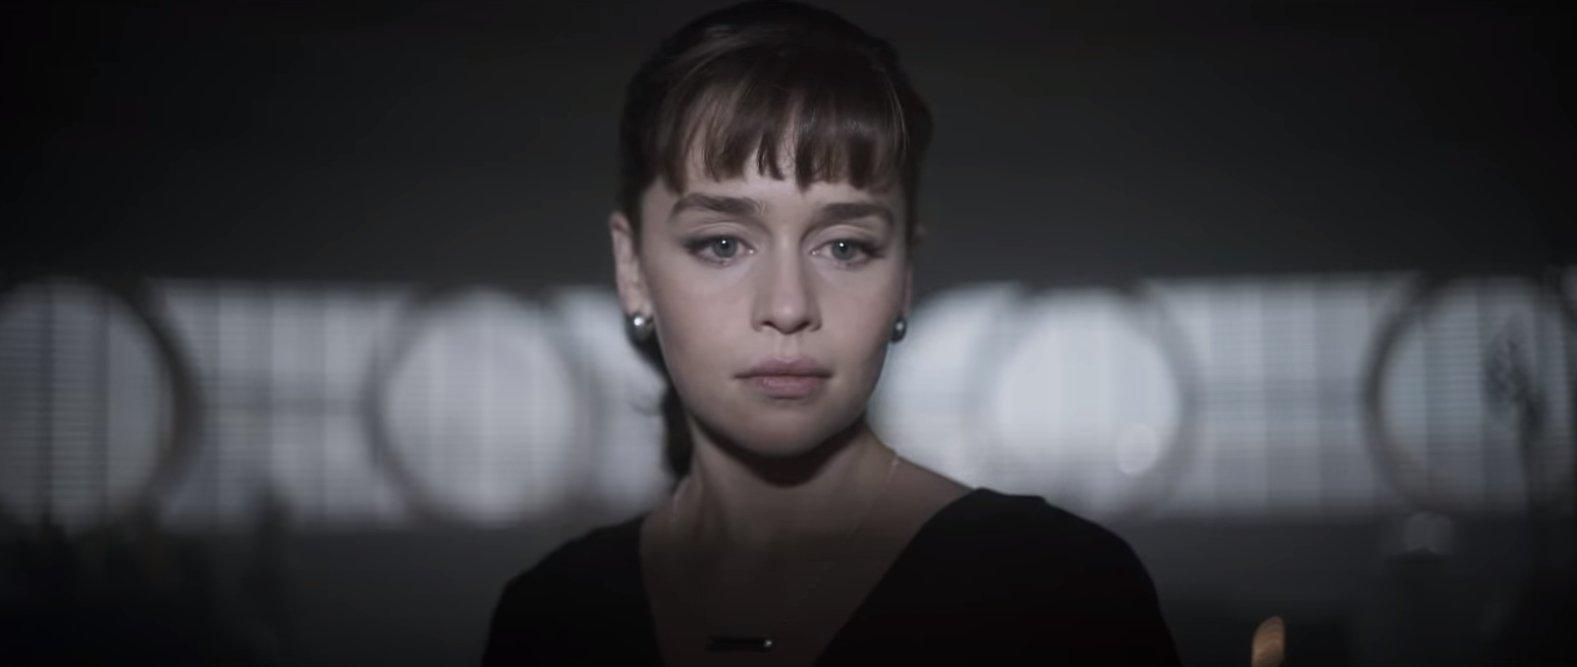 Emilia Clarke as Qi'ra in Solo